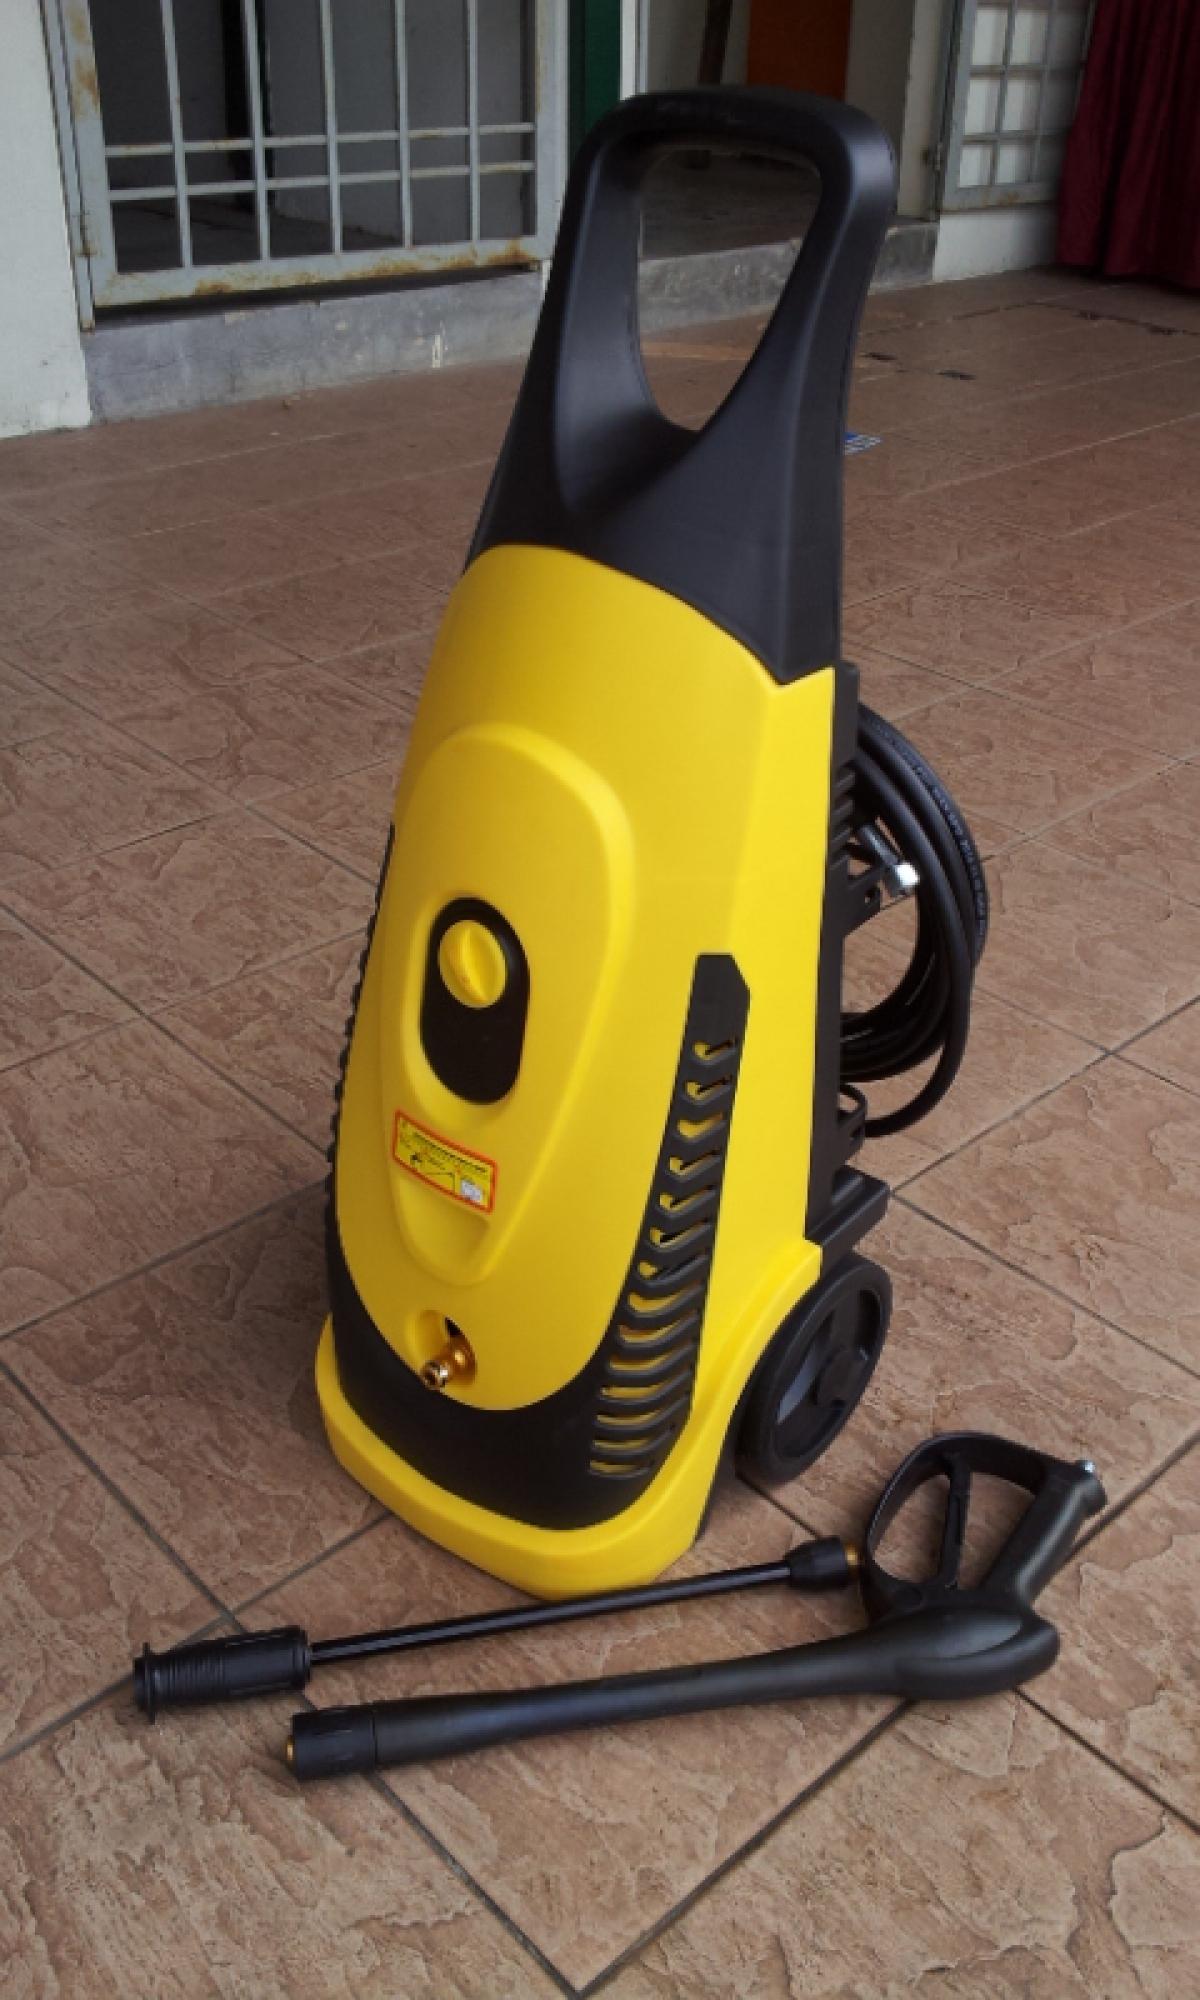 kingwash high pressure washer review